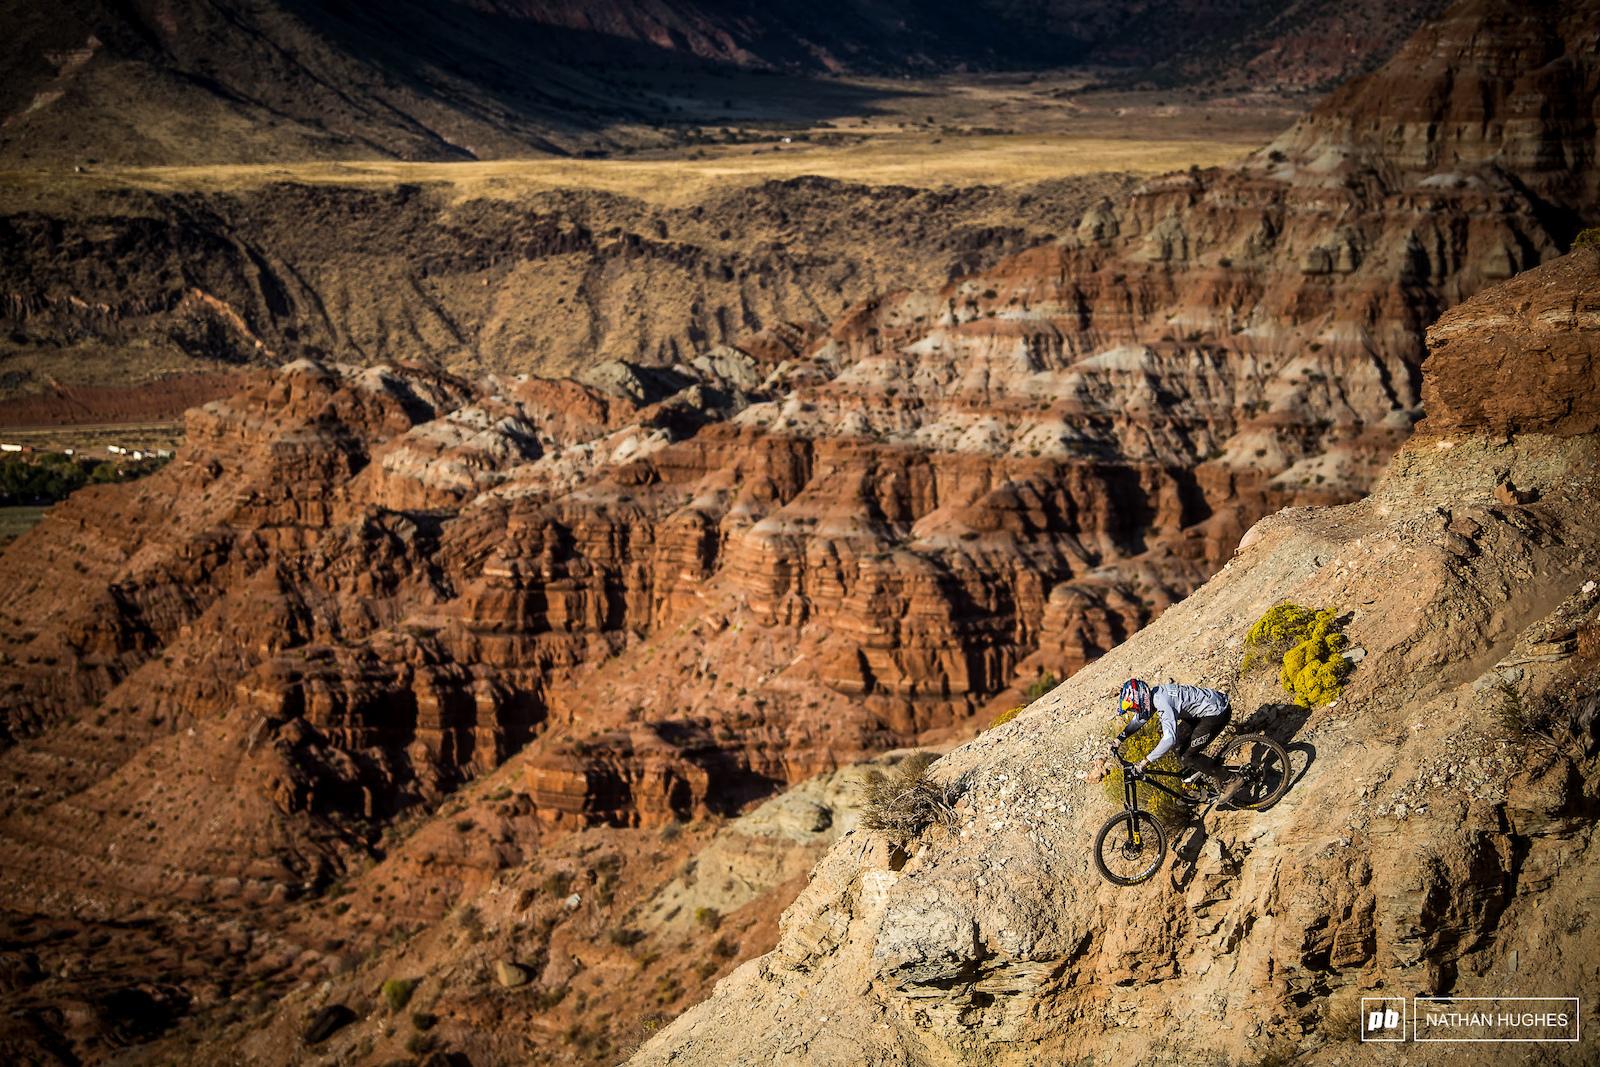 Godziek blending in to the epic Utah terrain.